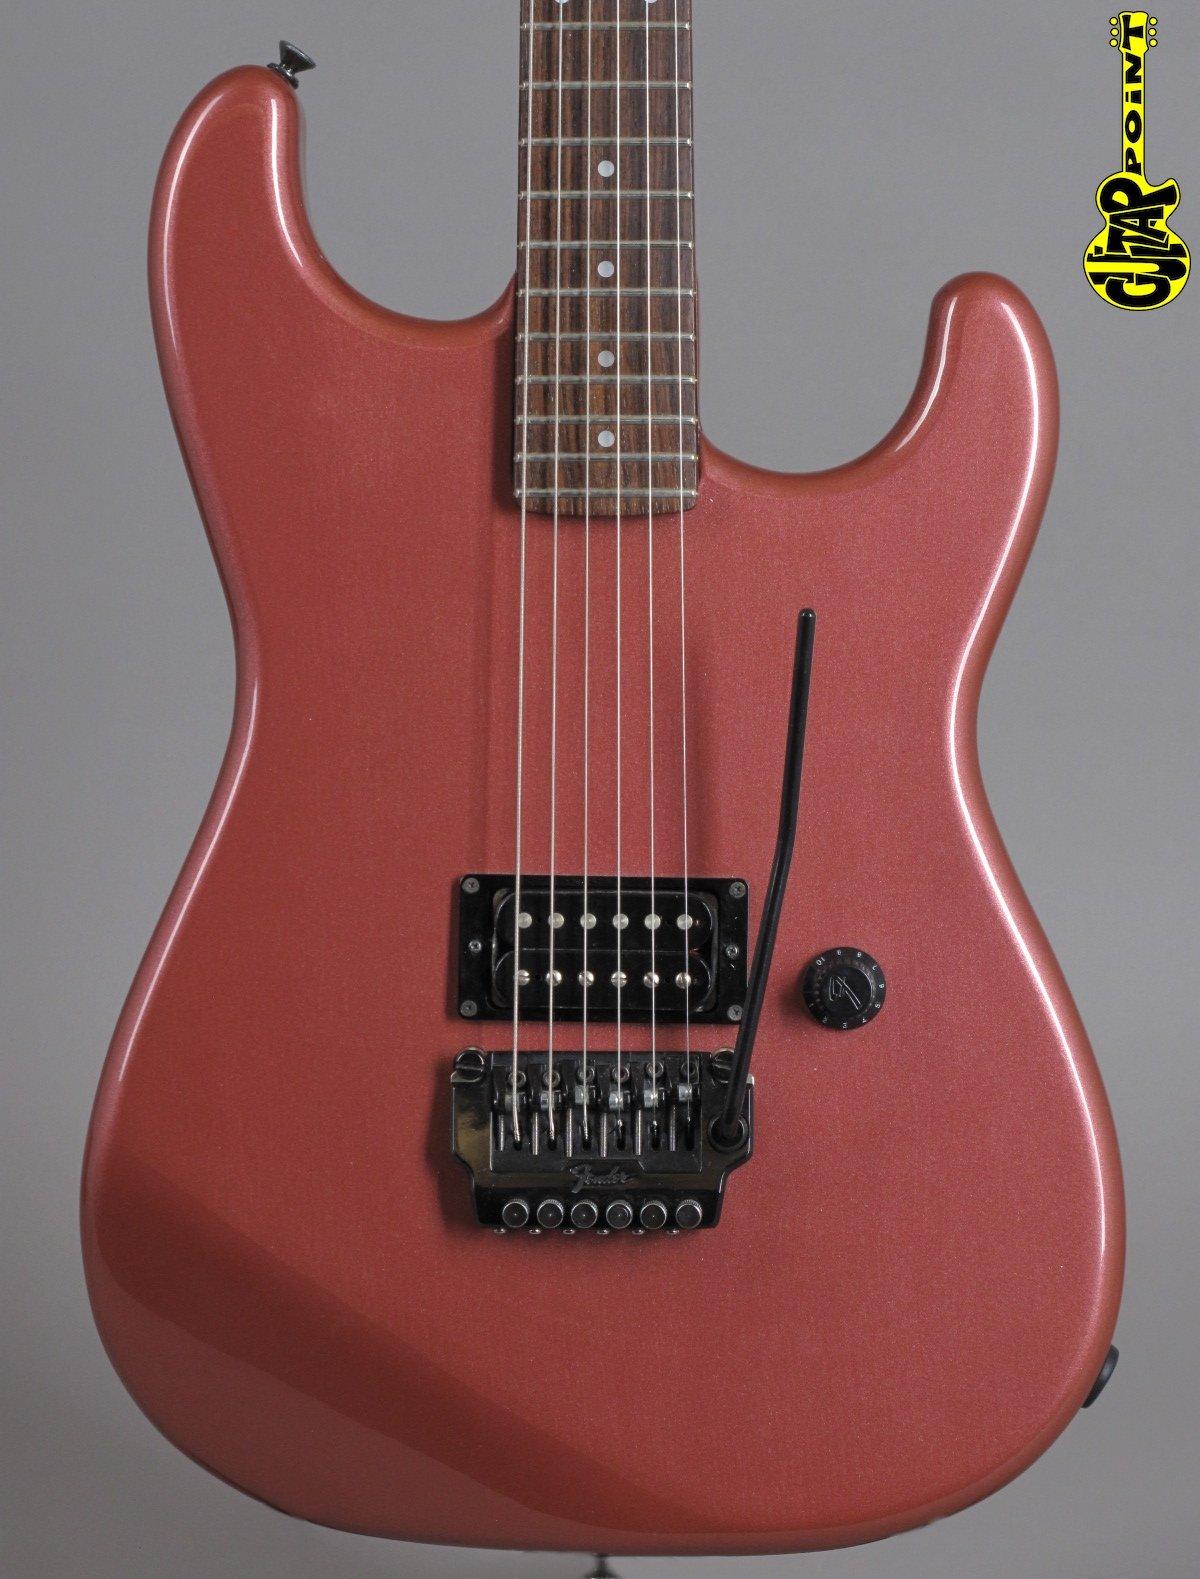 1985 Fender H.M. Stratocaster - Burgundy Mist Metallic